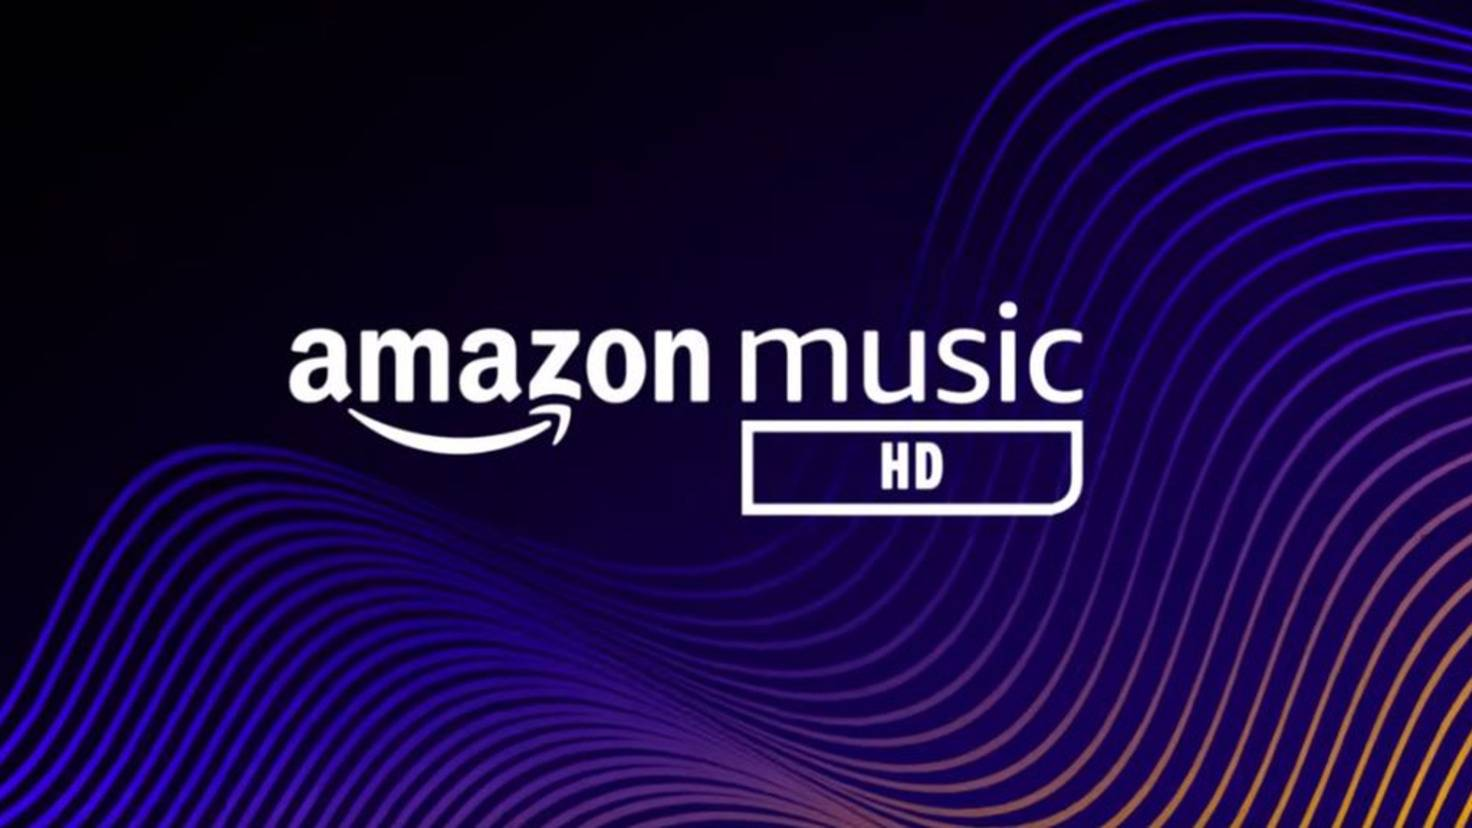 amazon-music-hd